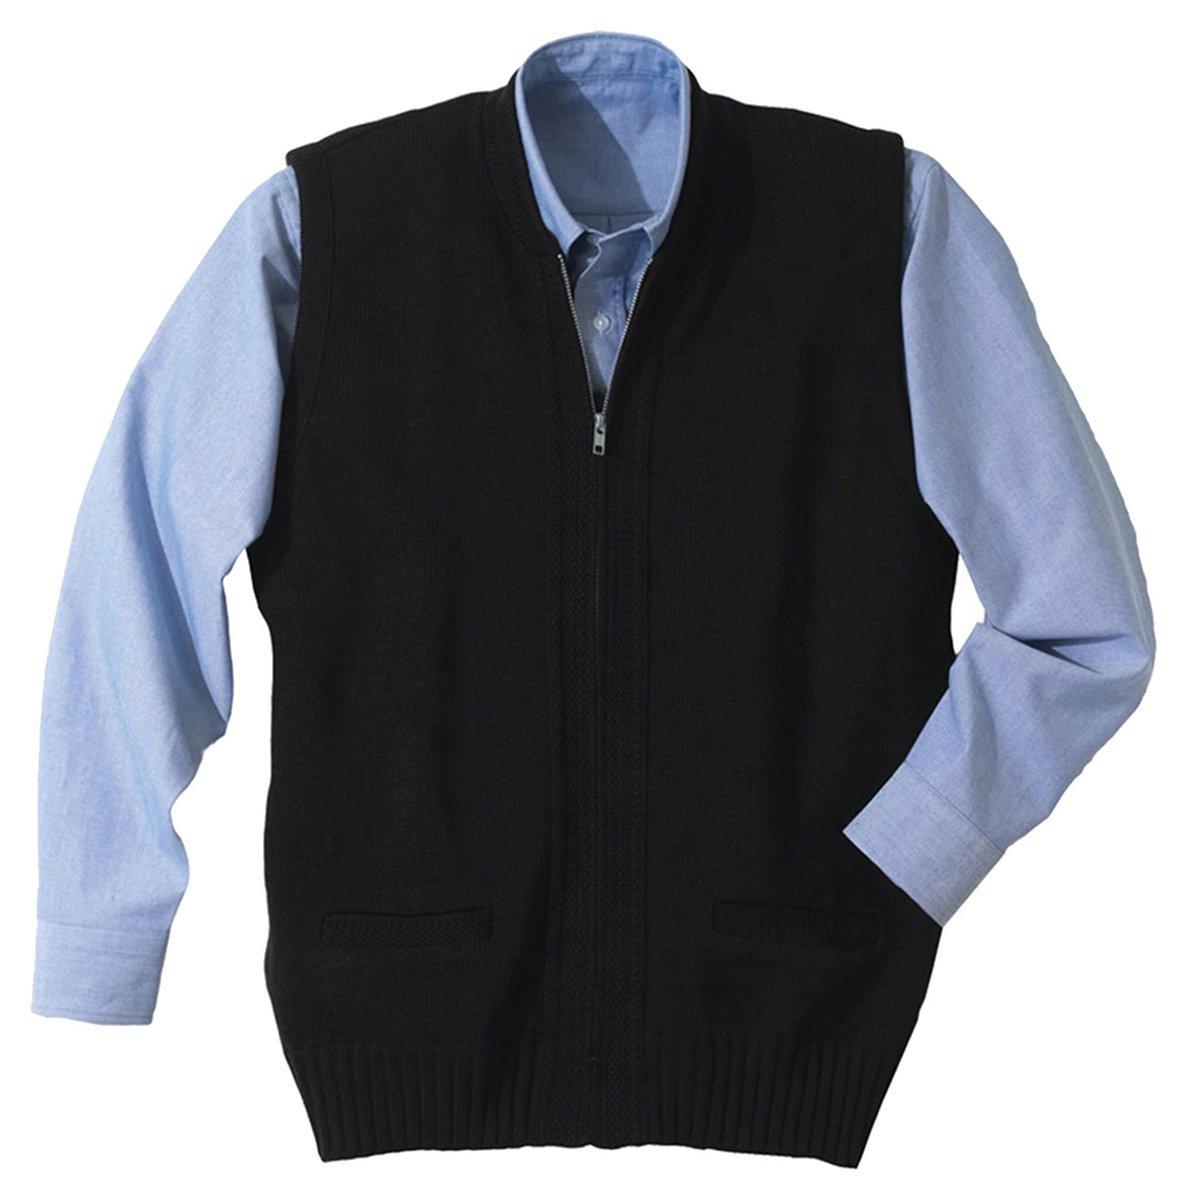 Edwards Garment Two Pockets Full Zip Sweater Vest, Navy, XXXX-Large by Edwards Garment